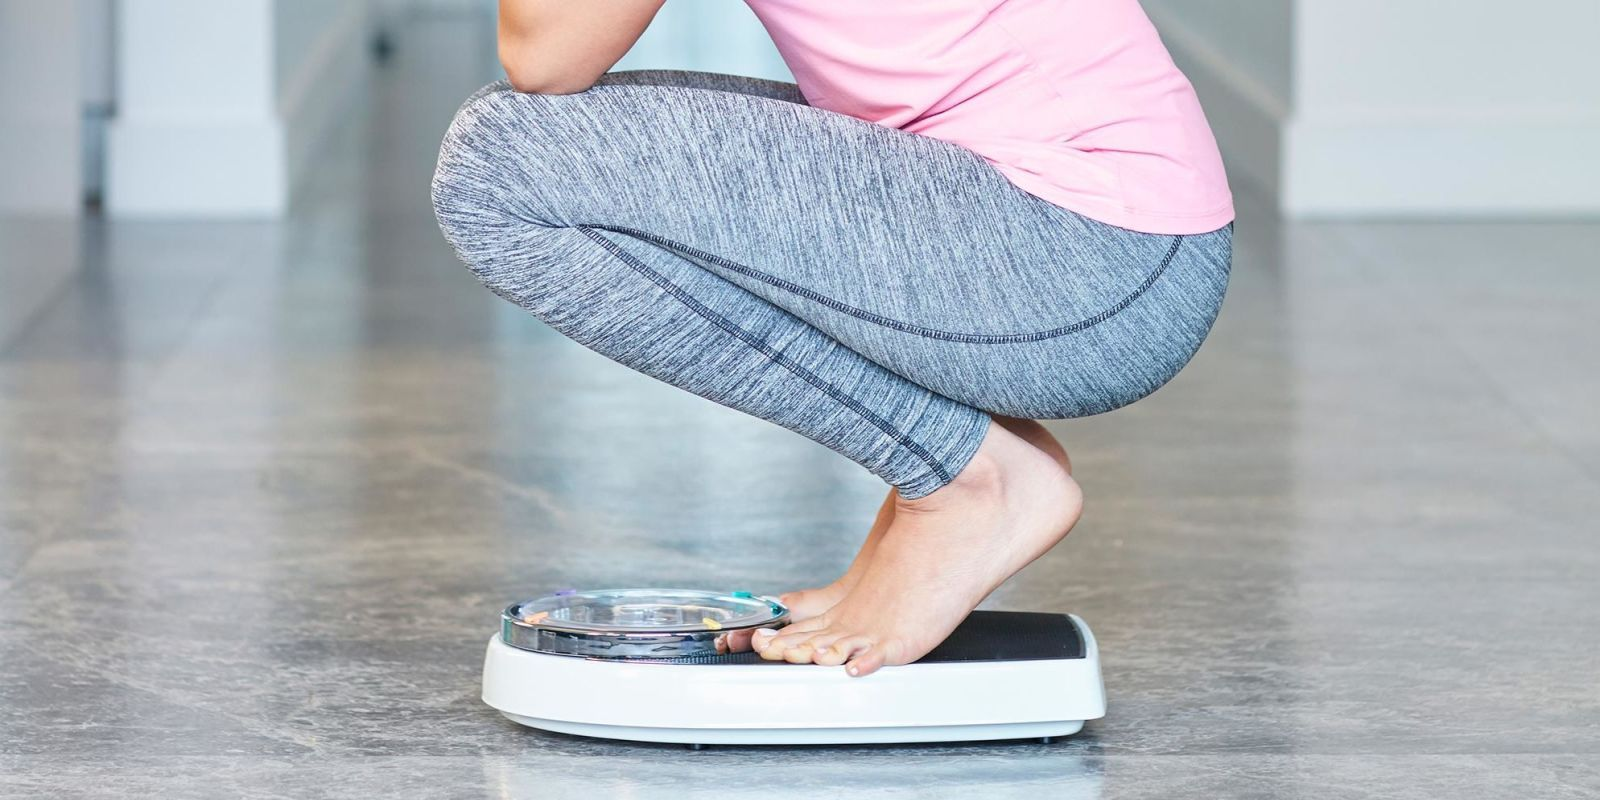 Programa perdida de peso ellipse